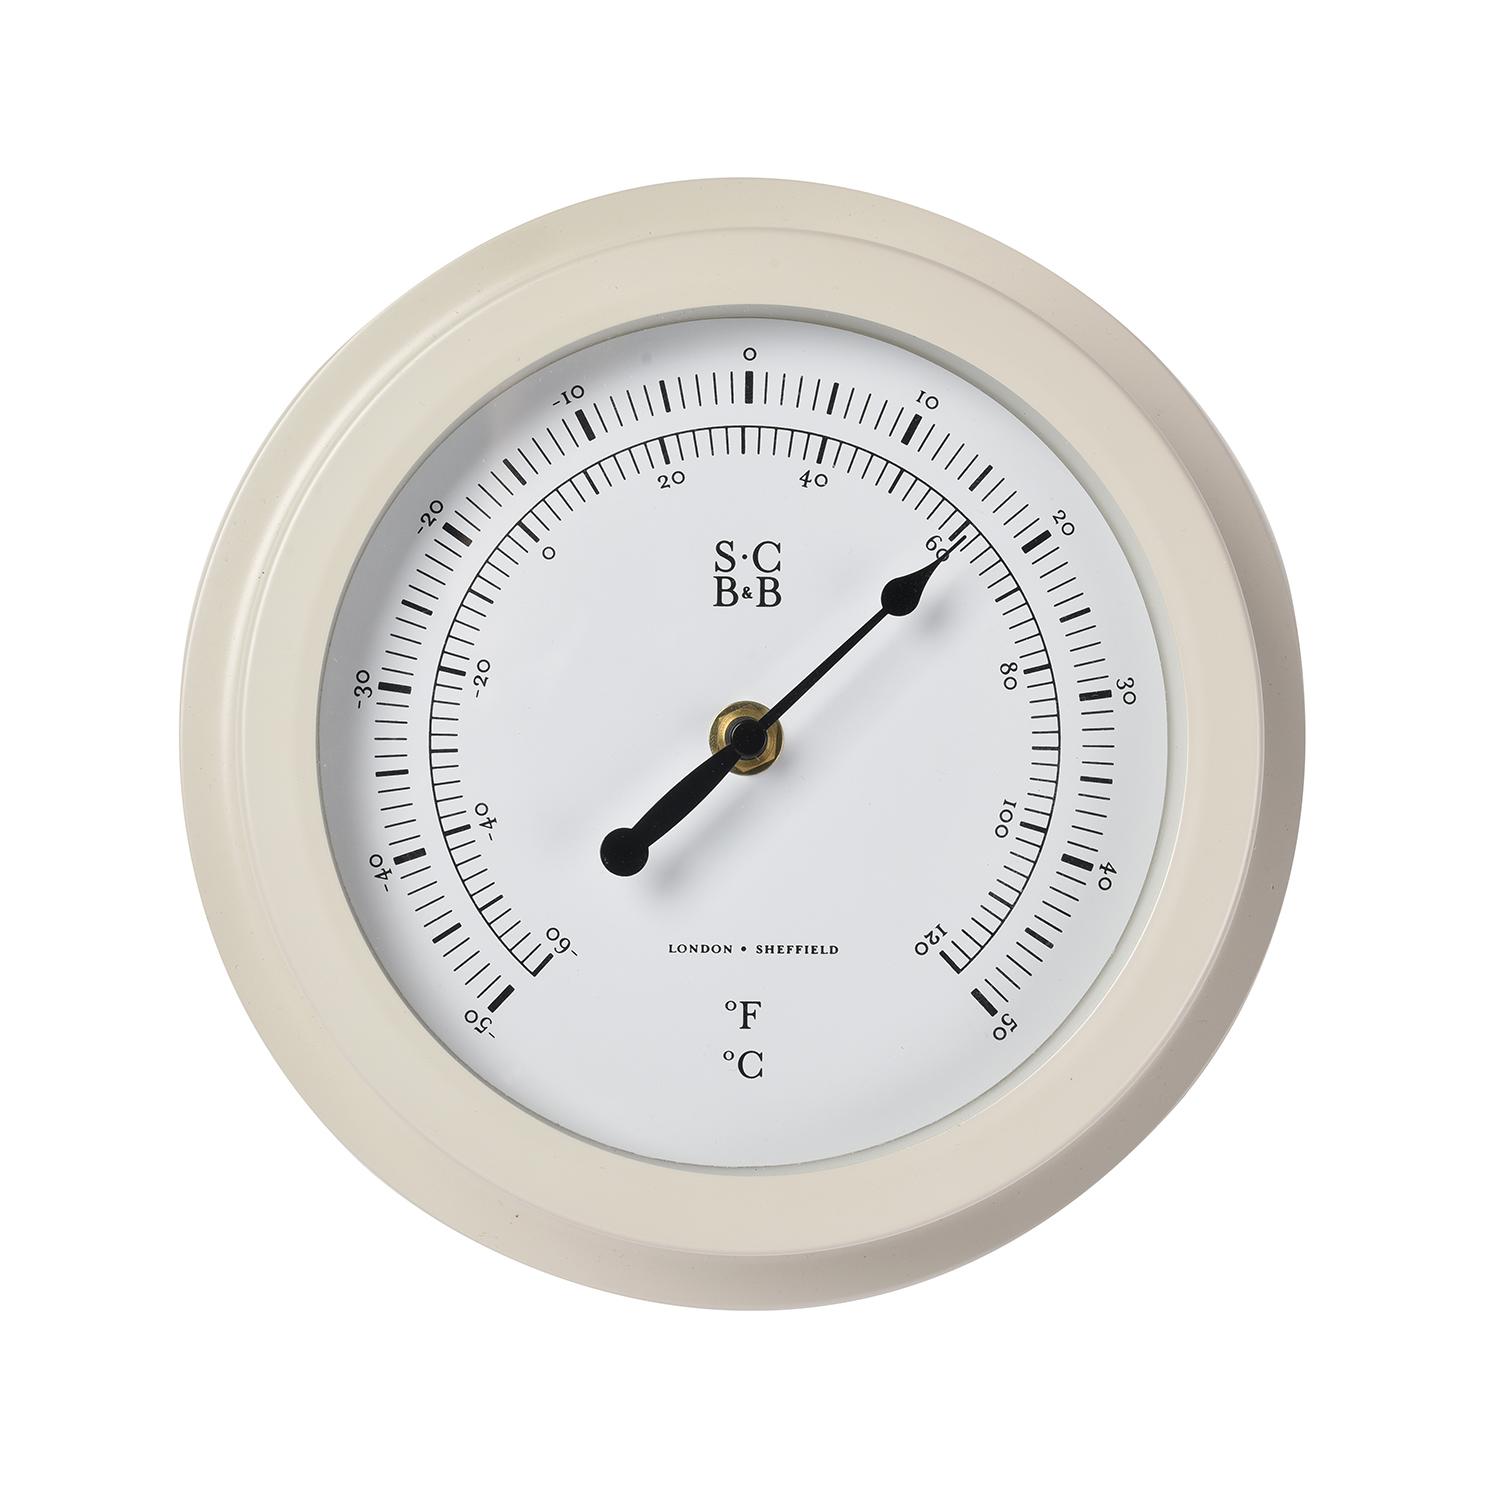 Burgon & Ball – Sophie Conran Buttermilk Garden Dial Thermometer in Gift Box